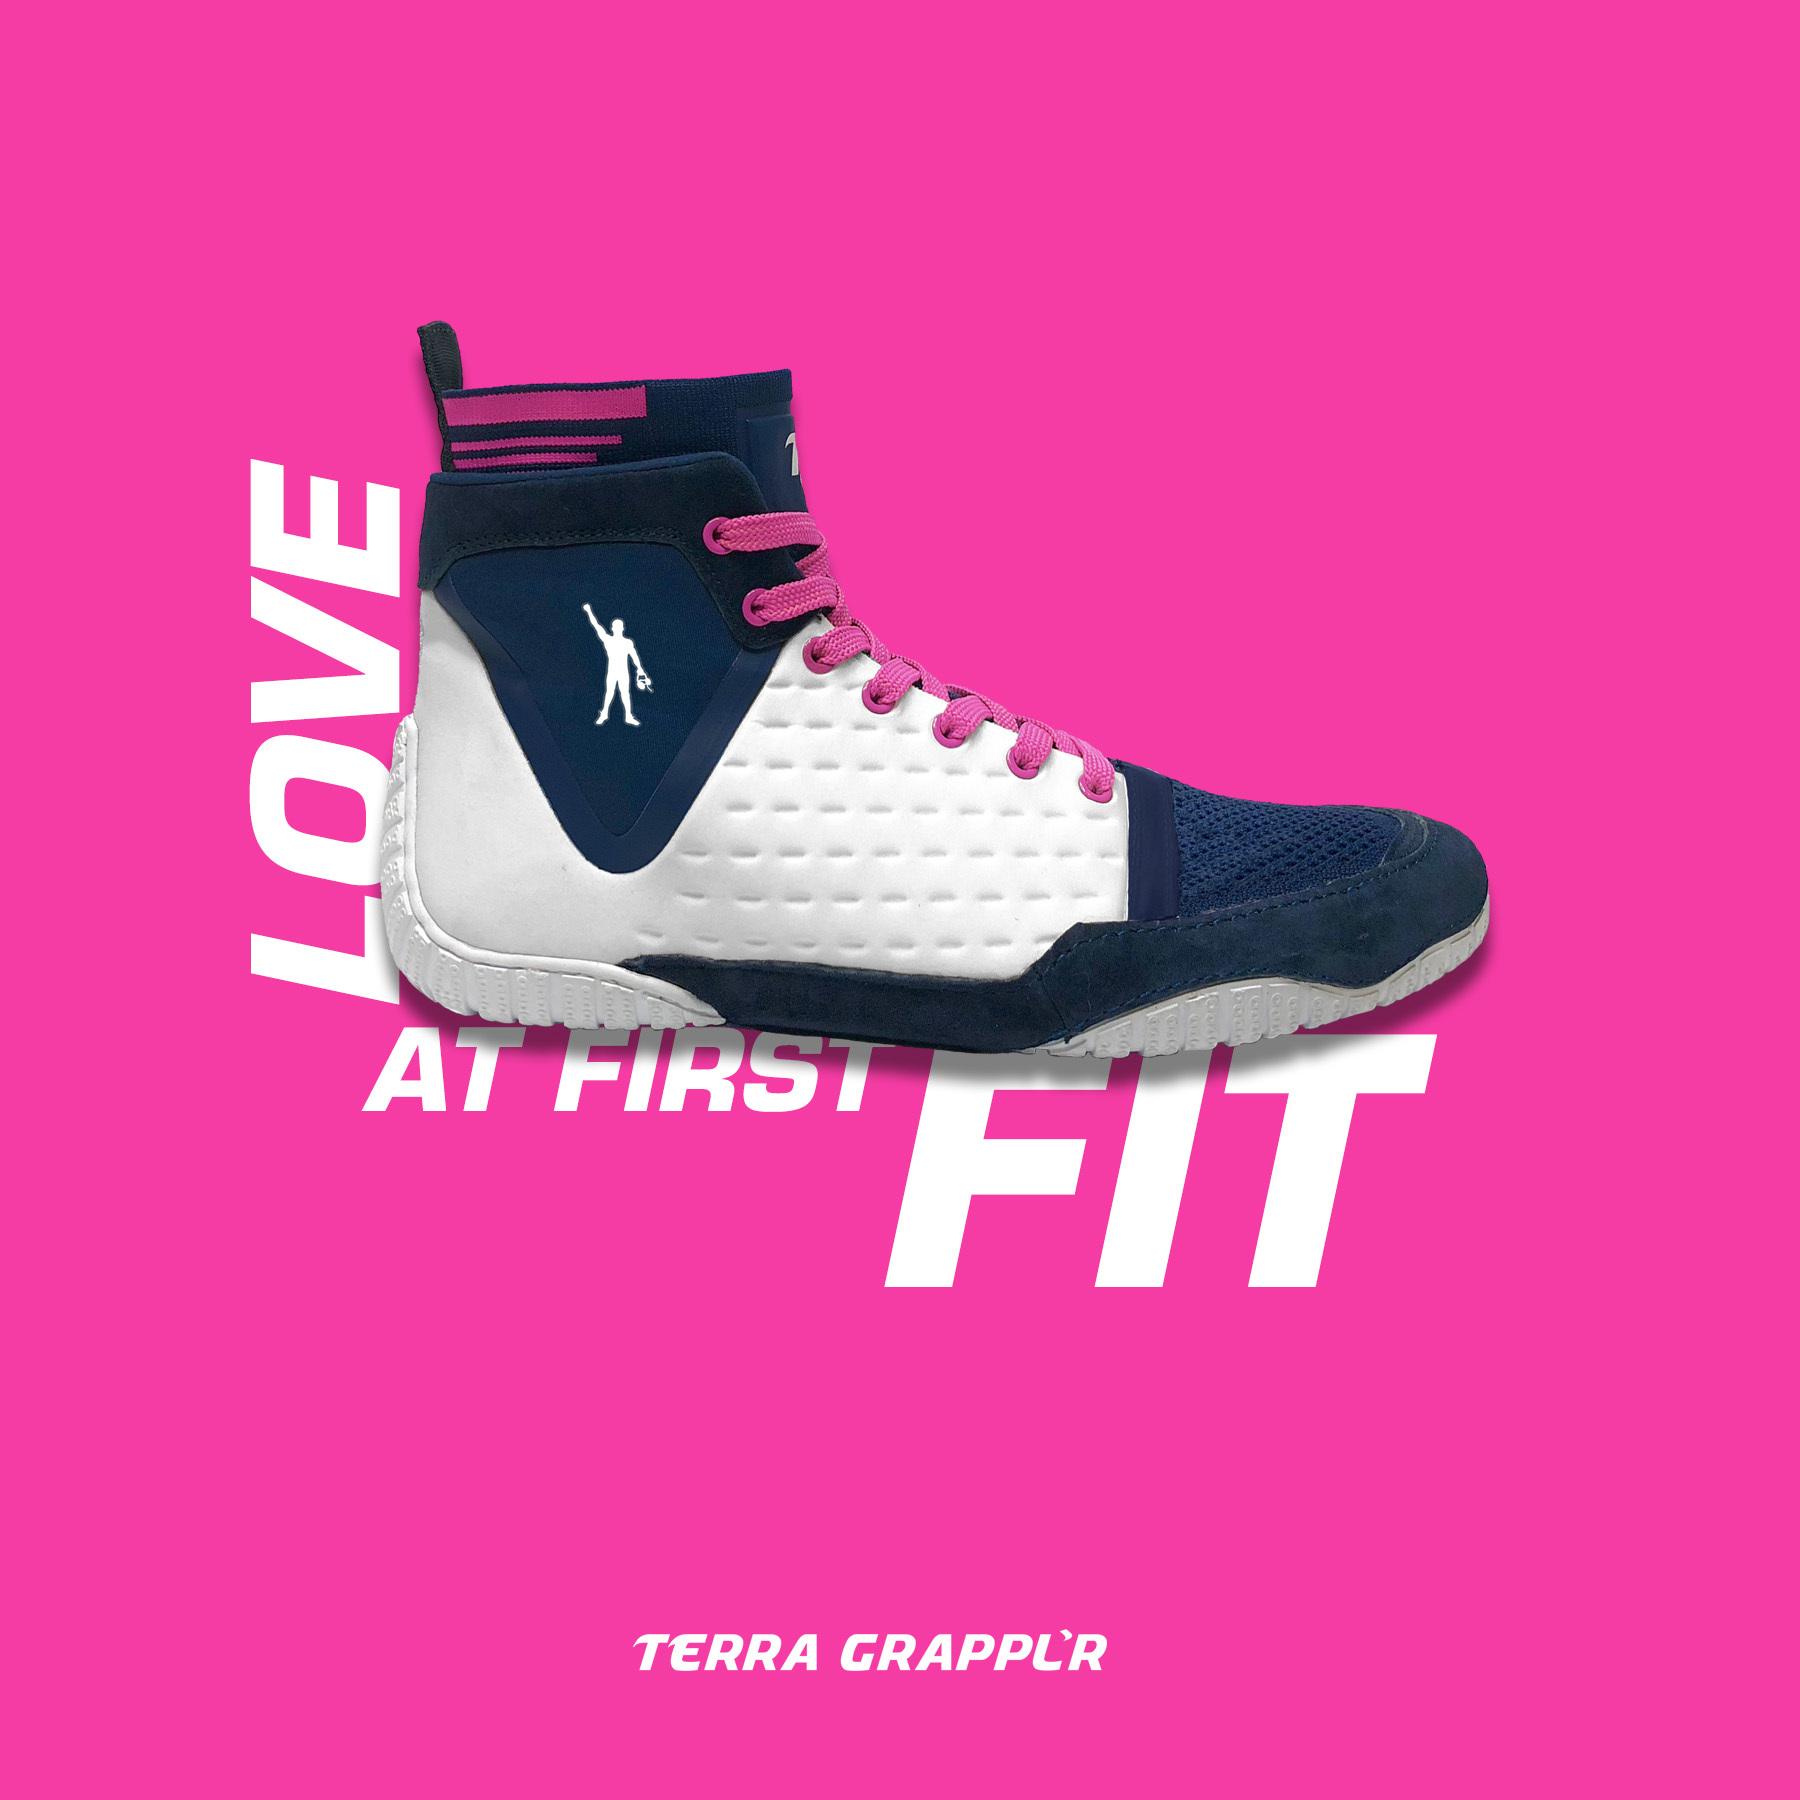 TERRA GRAPPL'R Premier SISSY Edition Wrestling Shoe